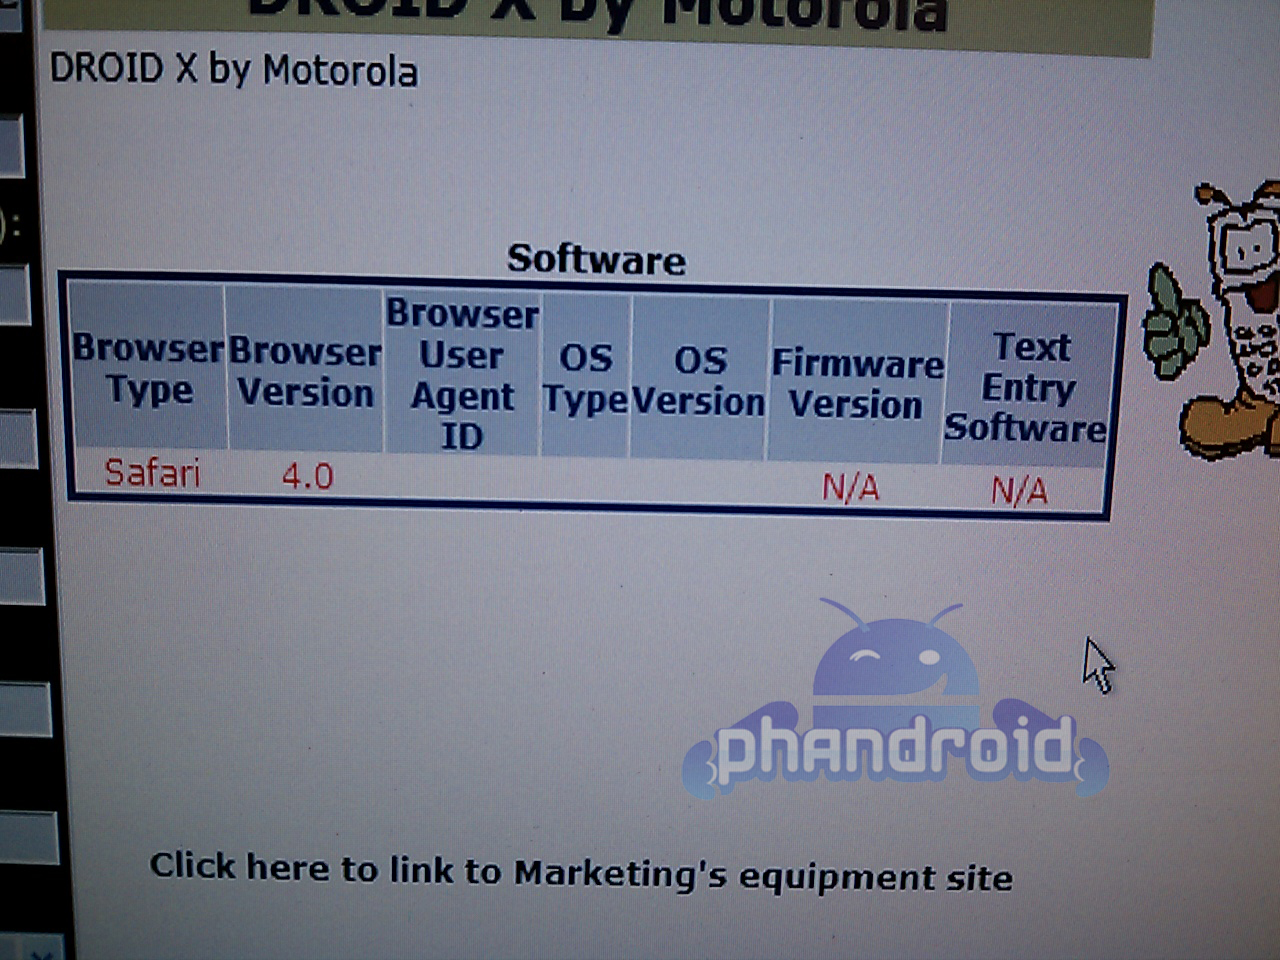 DroidXSoftware.jpg